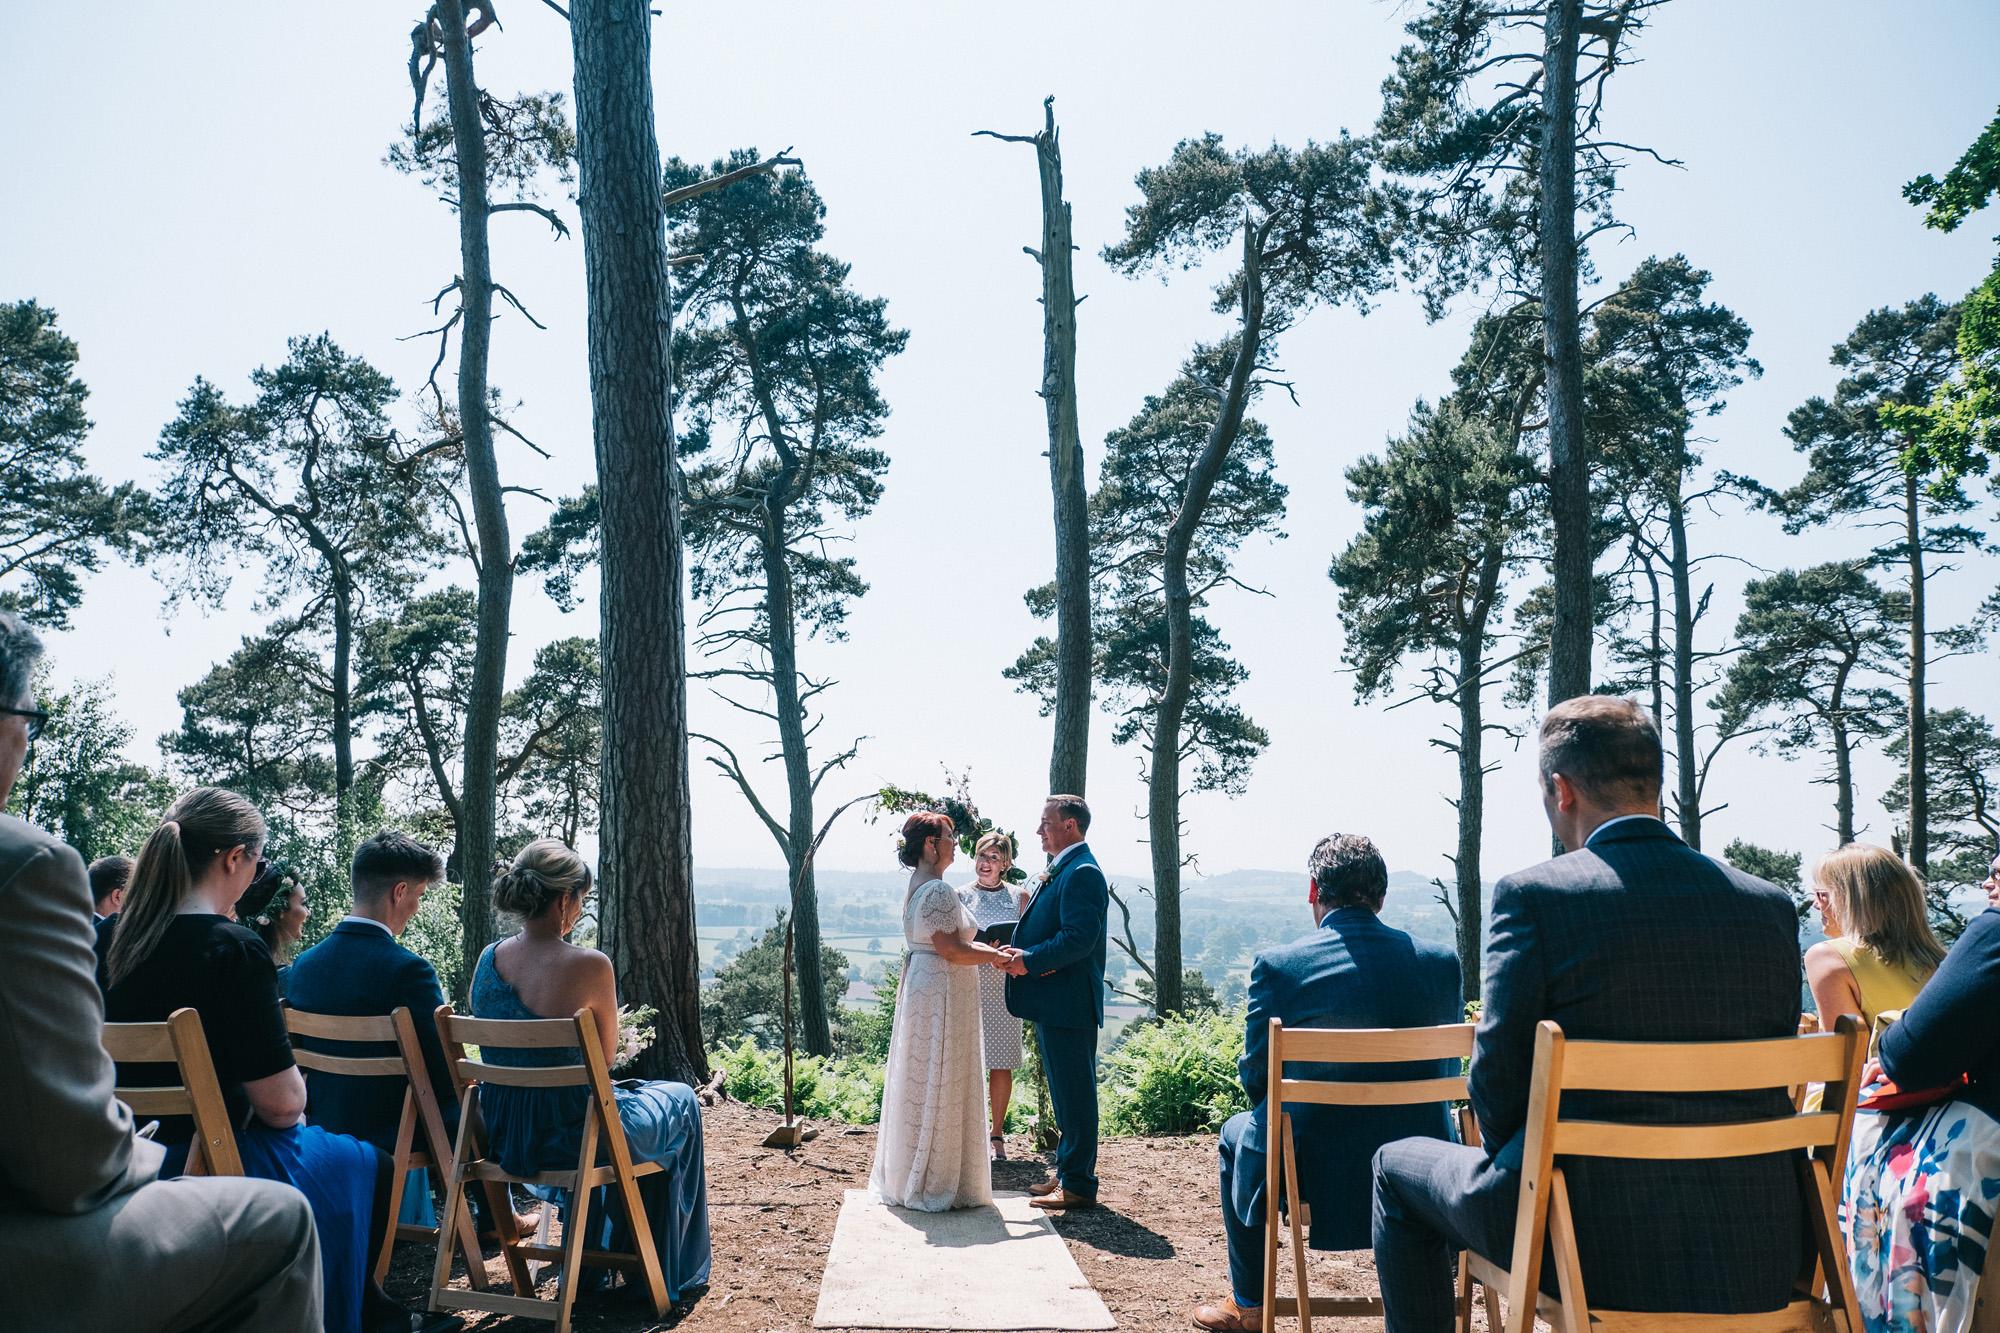 Bridgette-Dahlia-Blush-Silk-Lace-Wedding-Dress-Kate-Beaumont-Sheffield-Ivory-Fayre-9.jpg